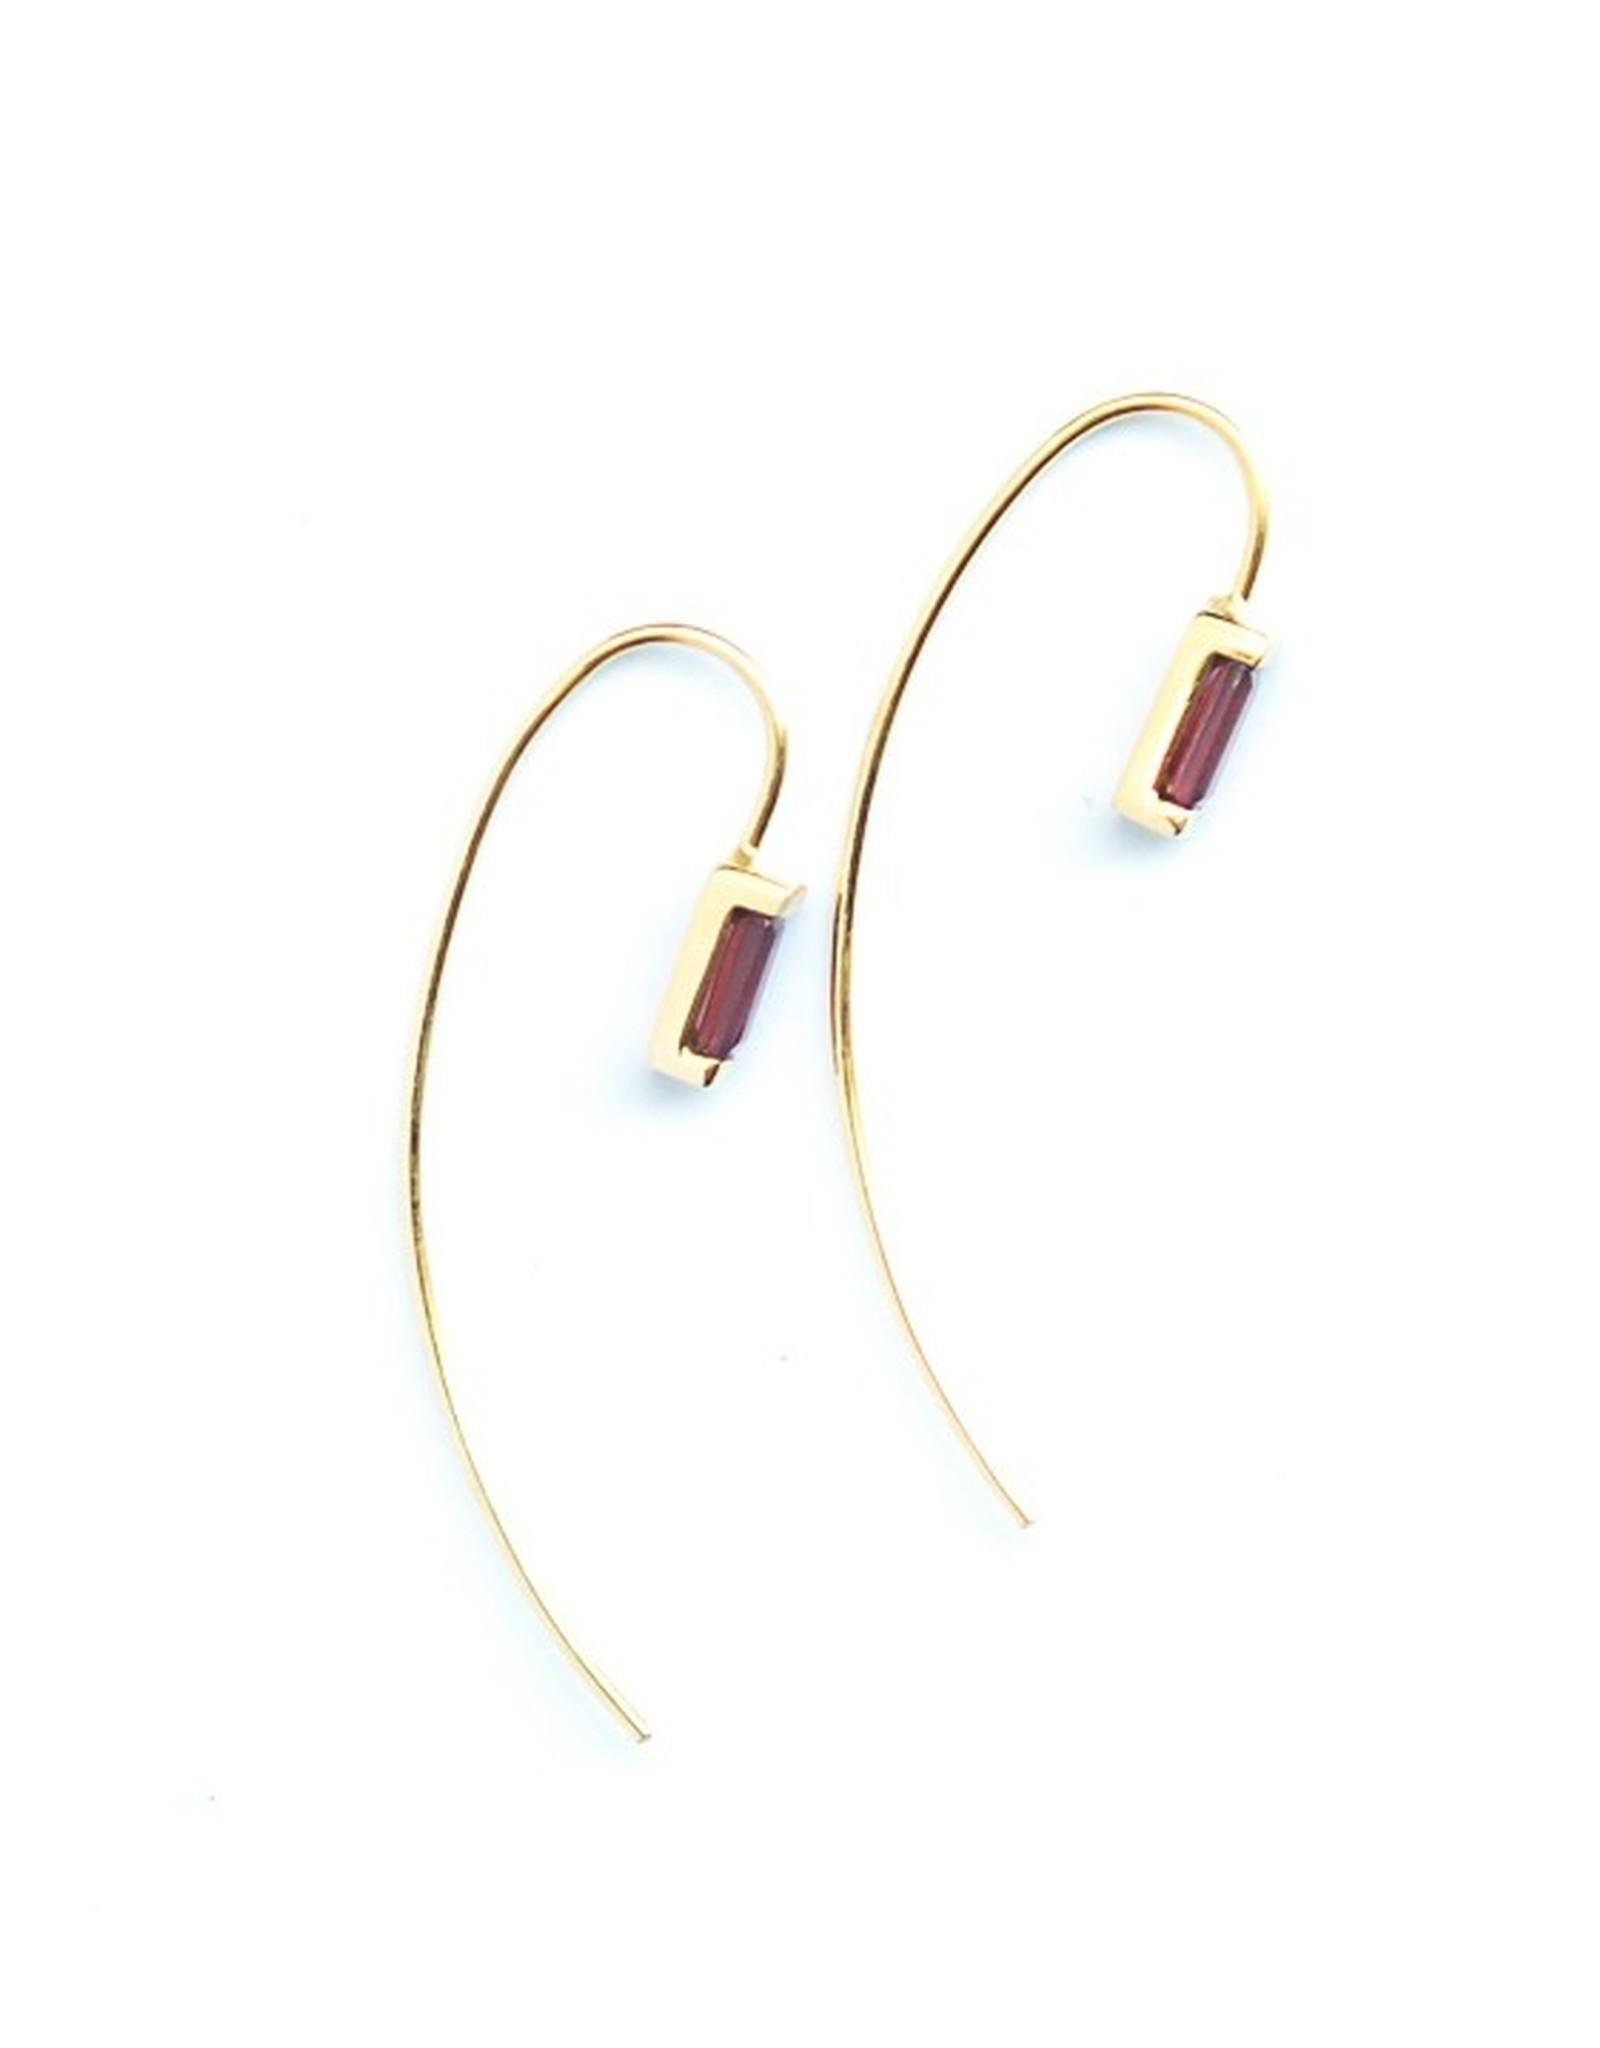 Fair Anita Prism Brass Earrings with Garnet